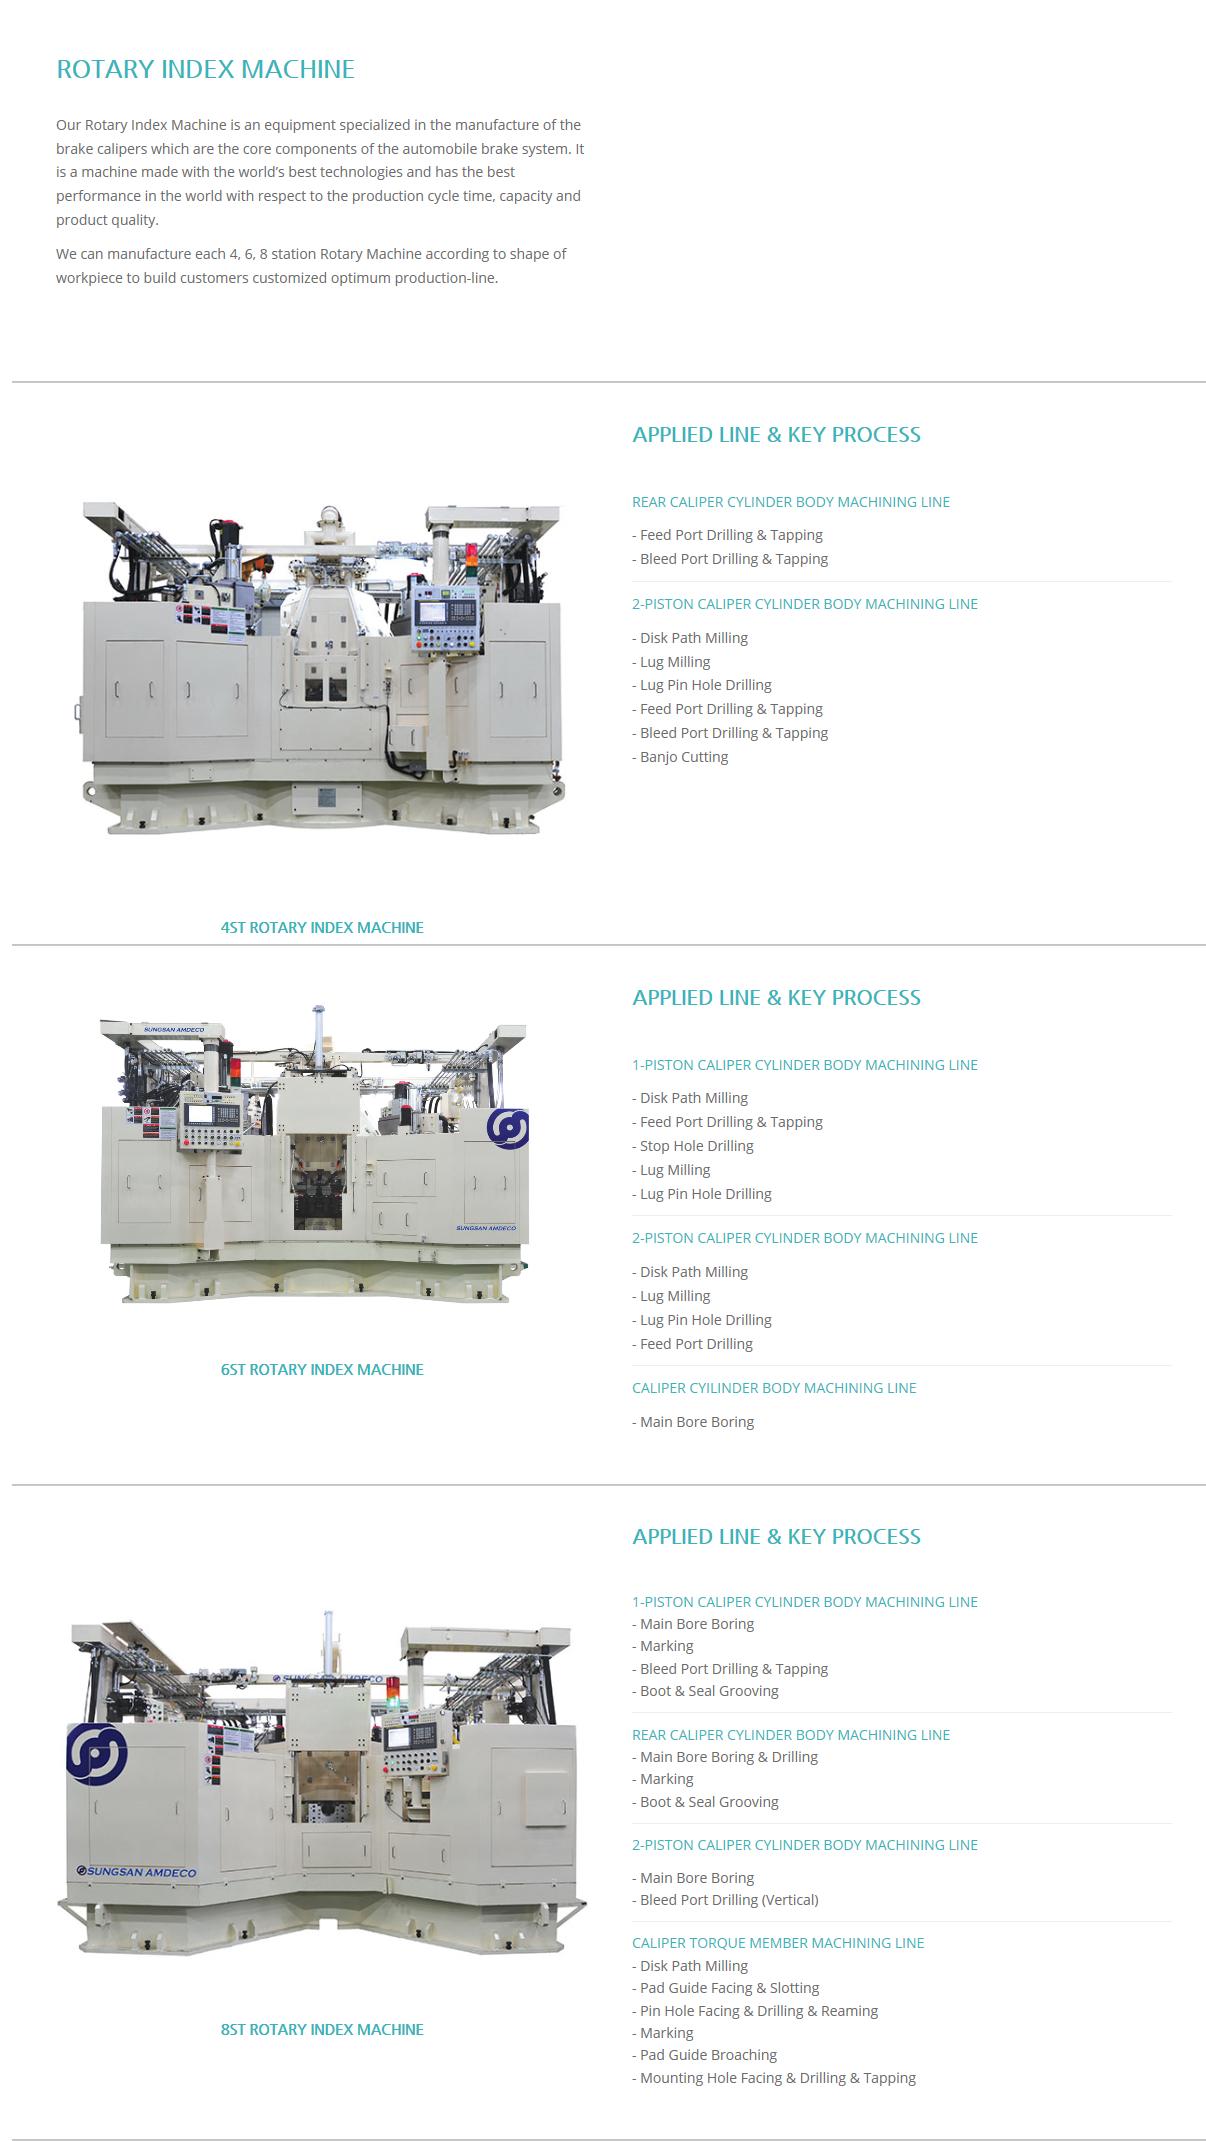 SUNGSAN AM DECO Rotary Index Machine